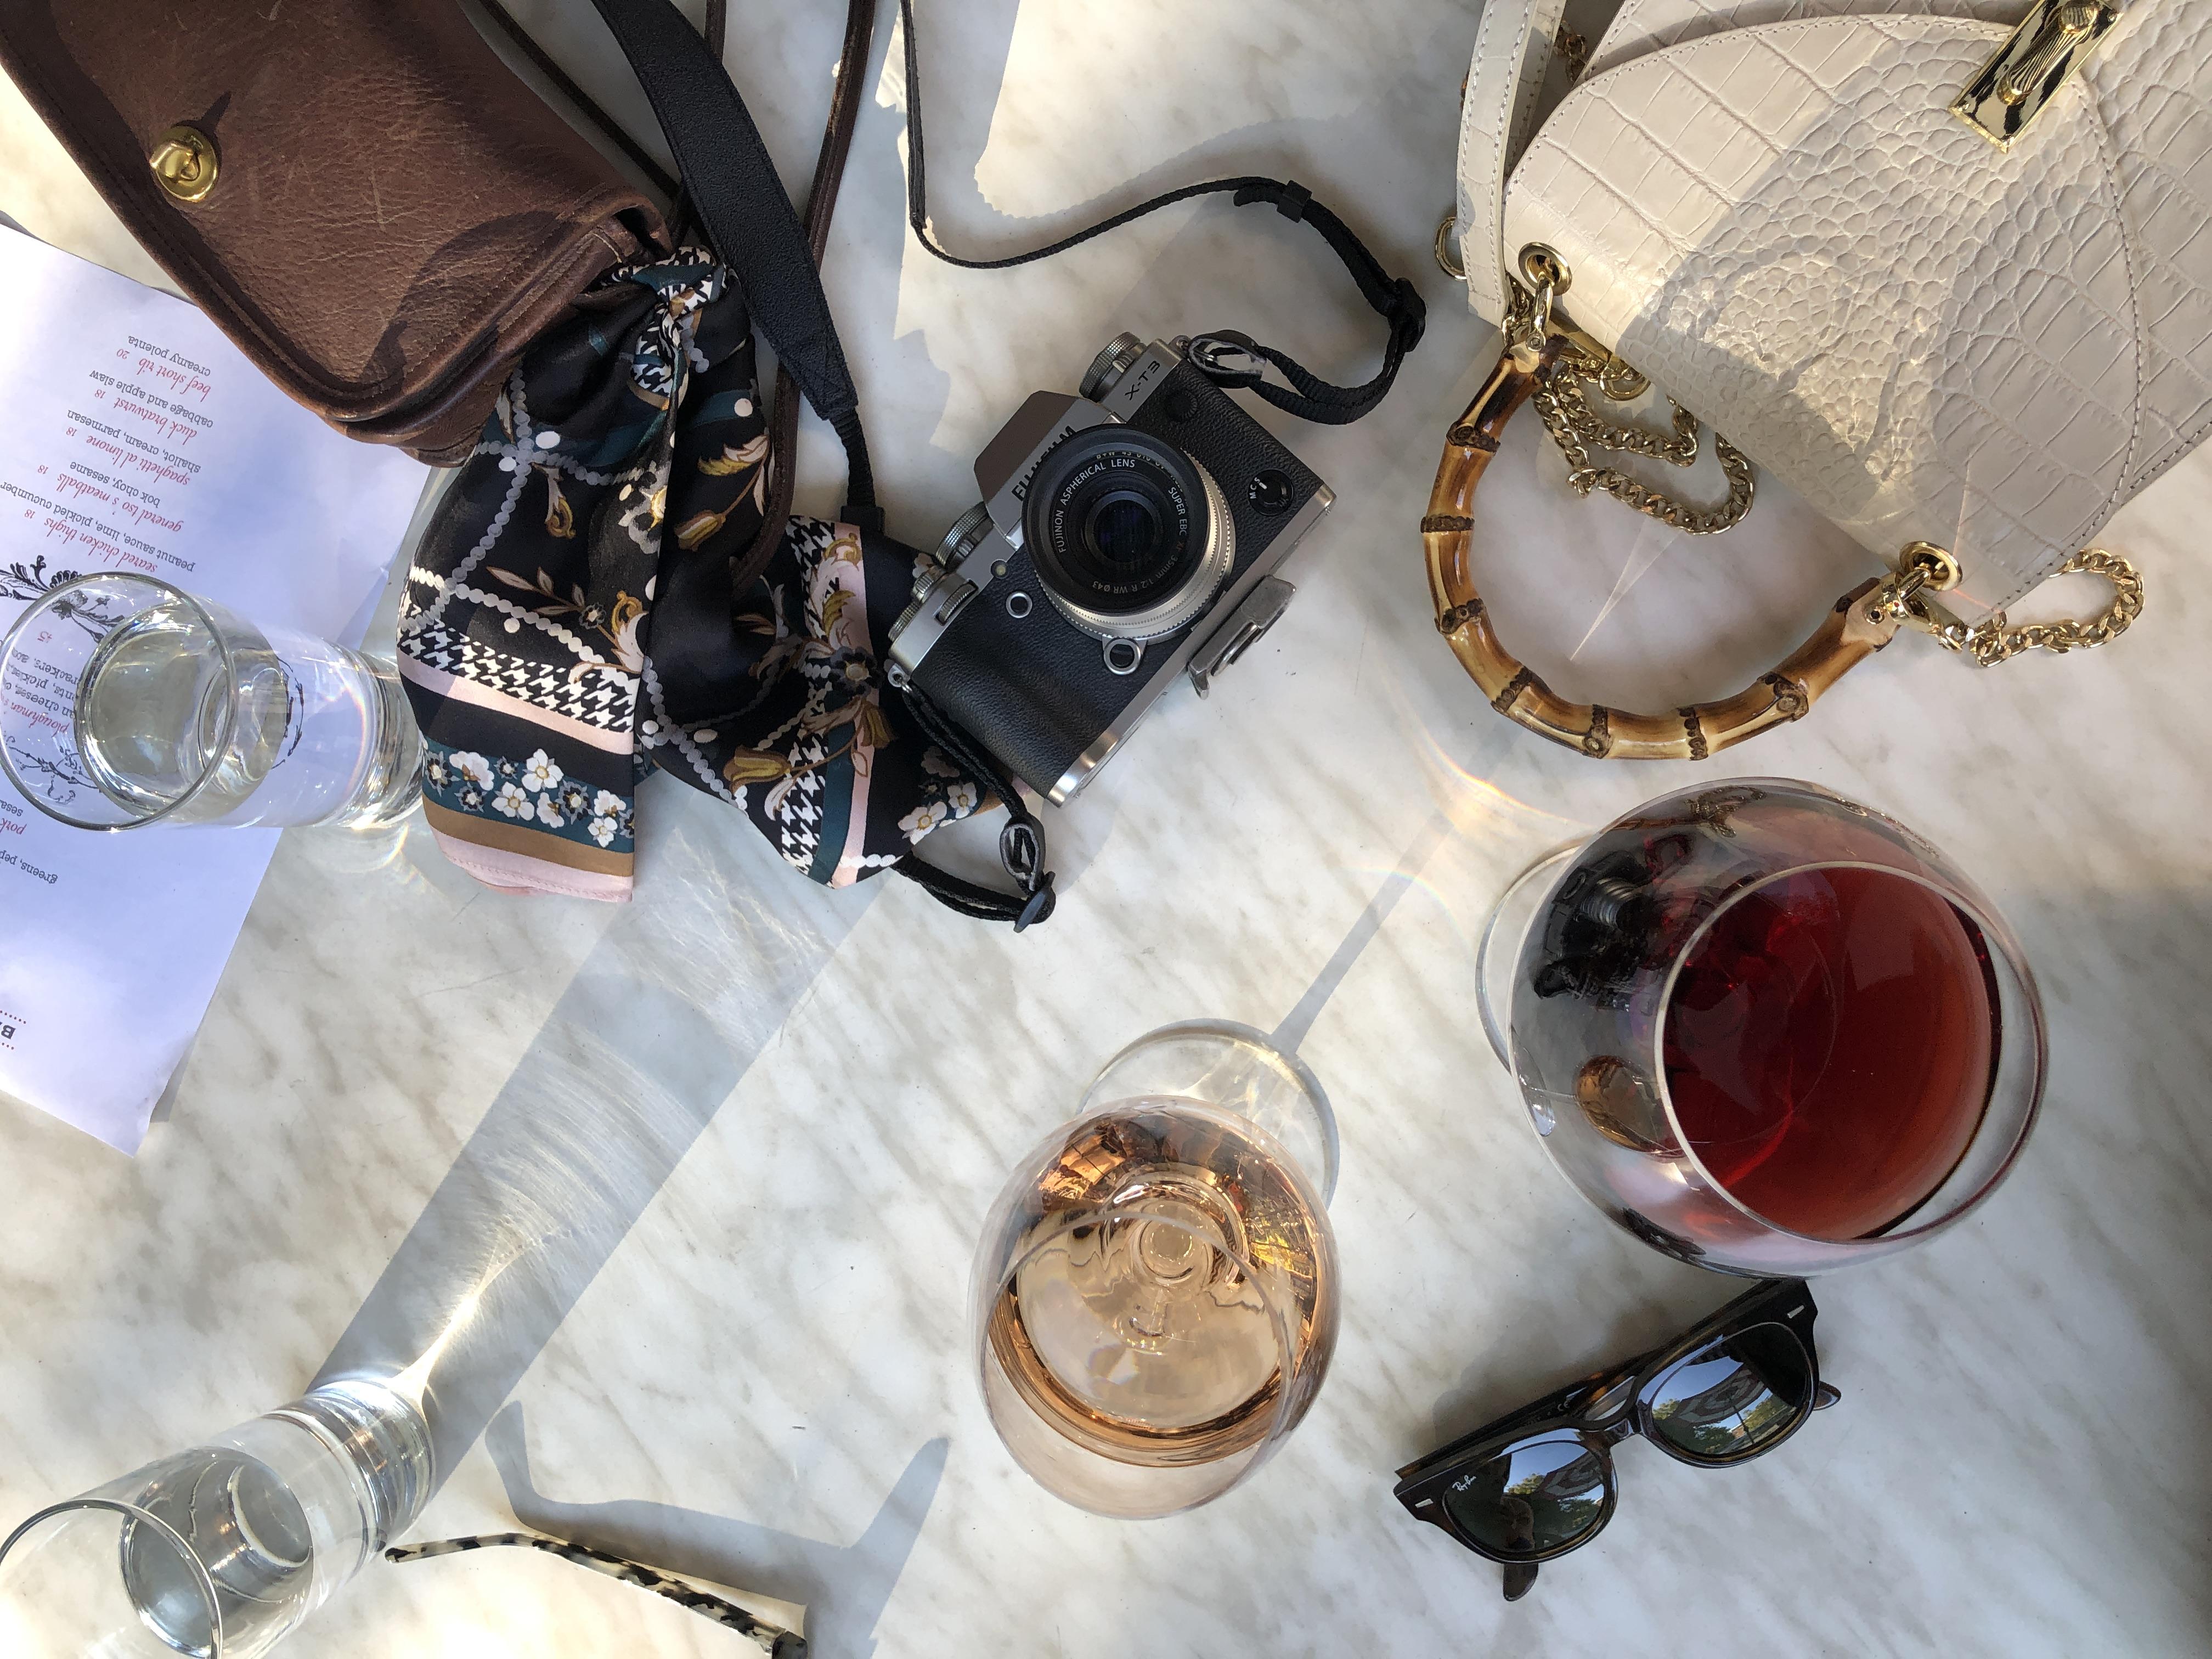 wine and camera